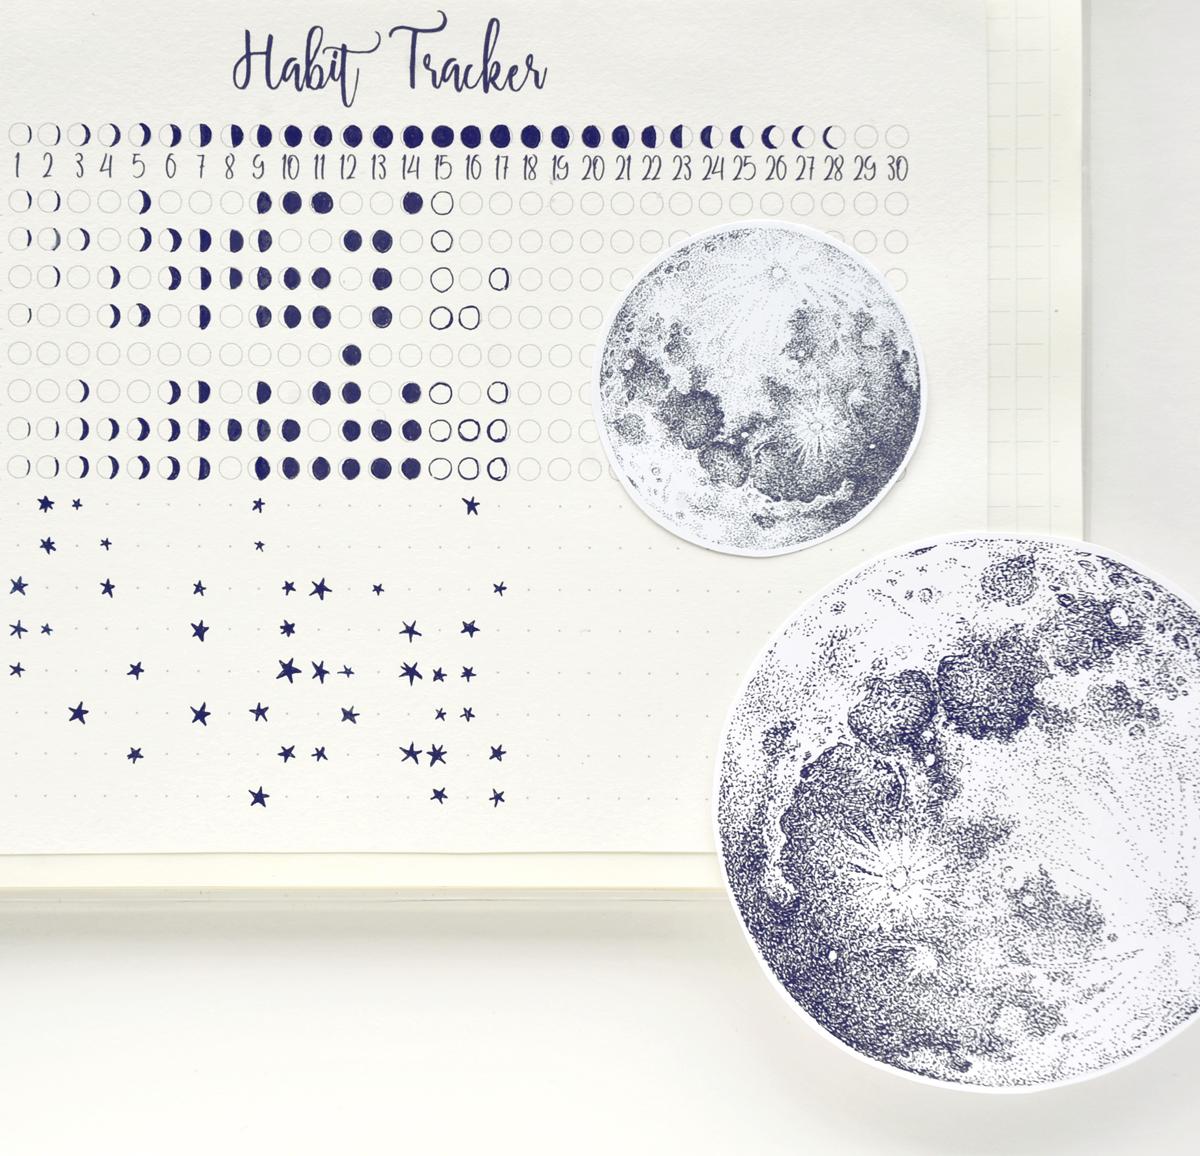 lunar-phases-habittracker-bujo.png